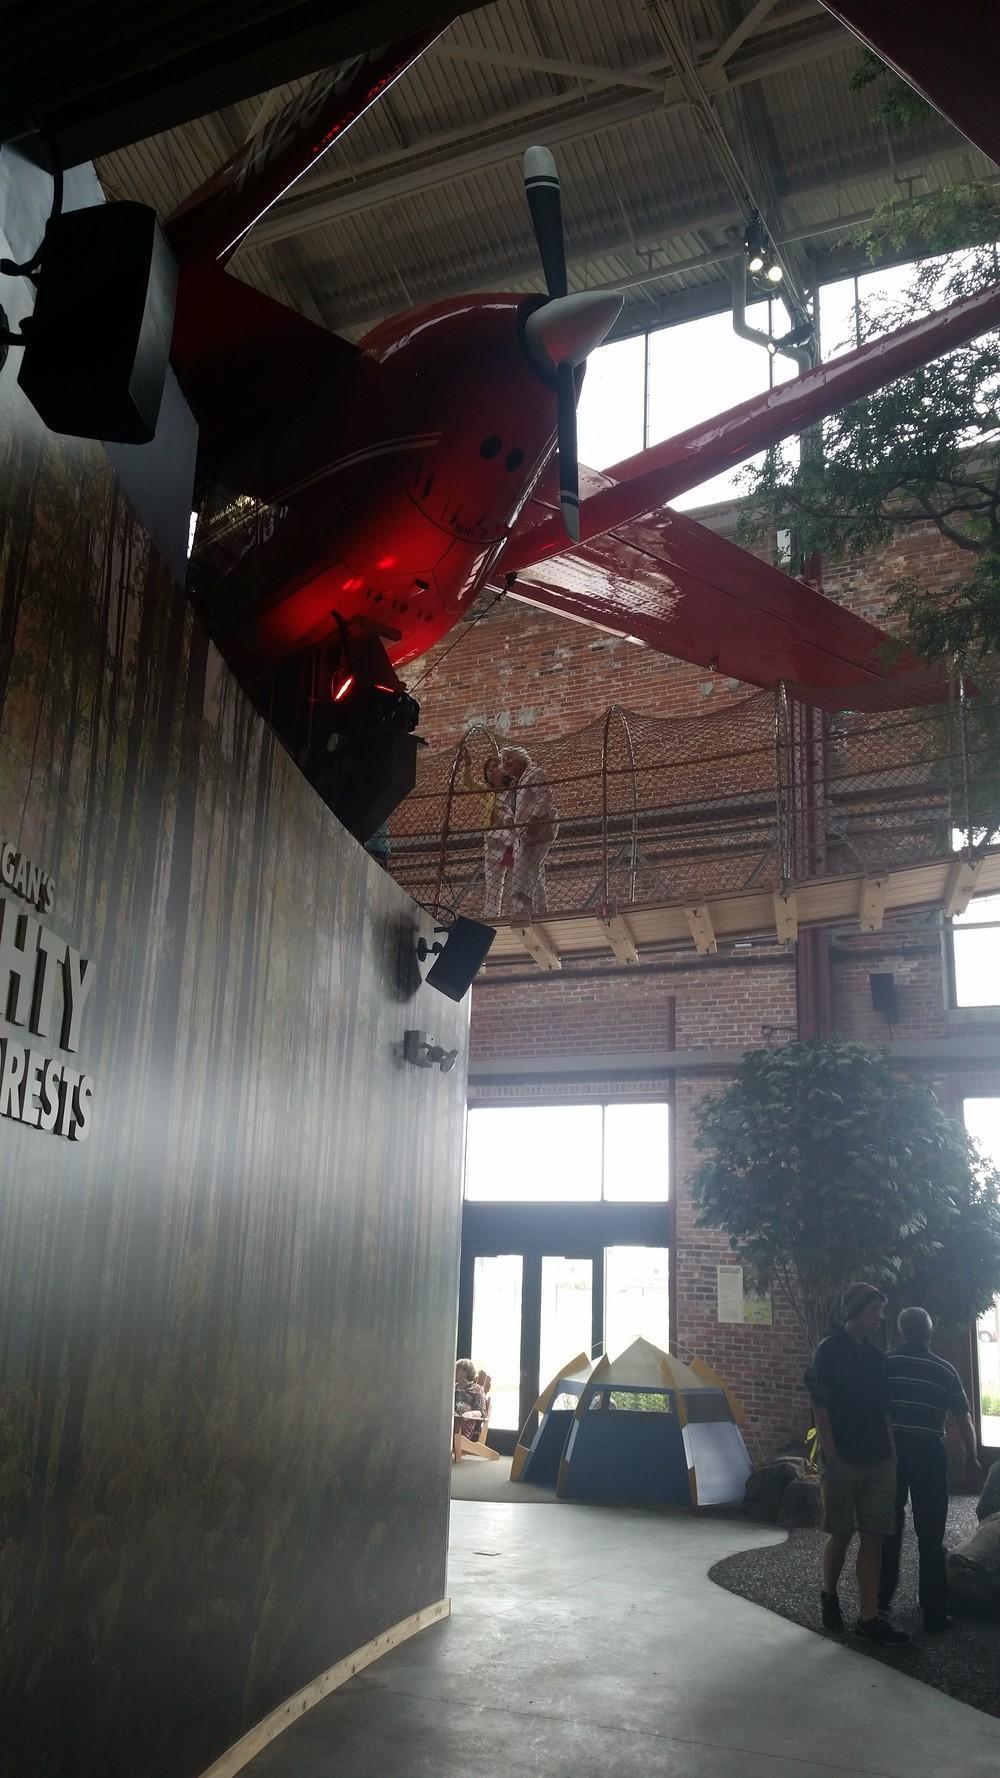 fire plane simulator